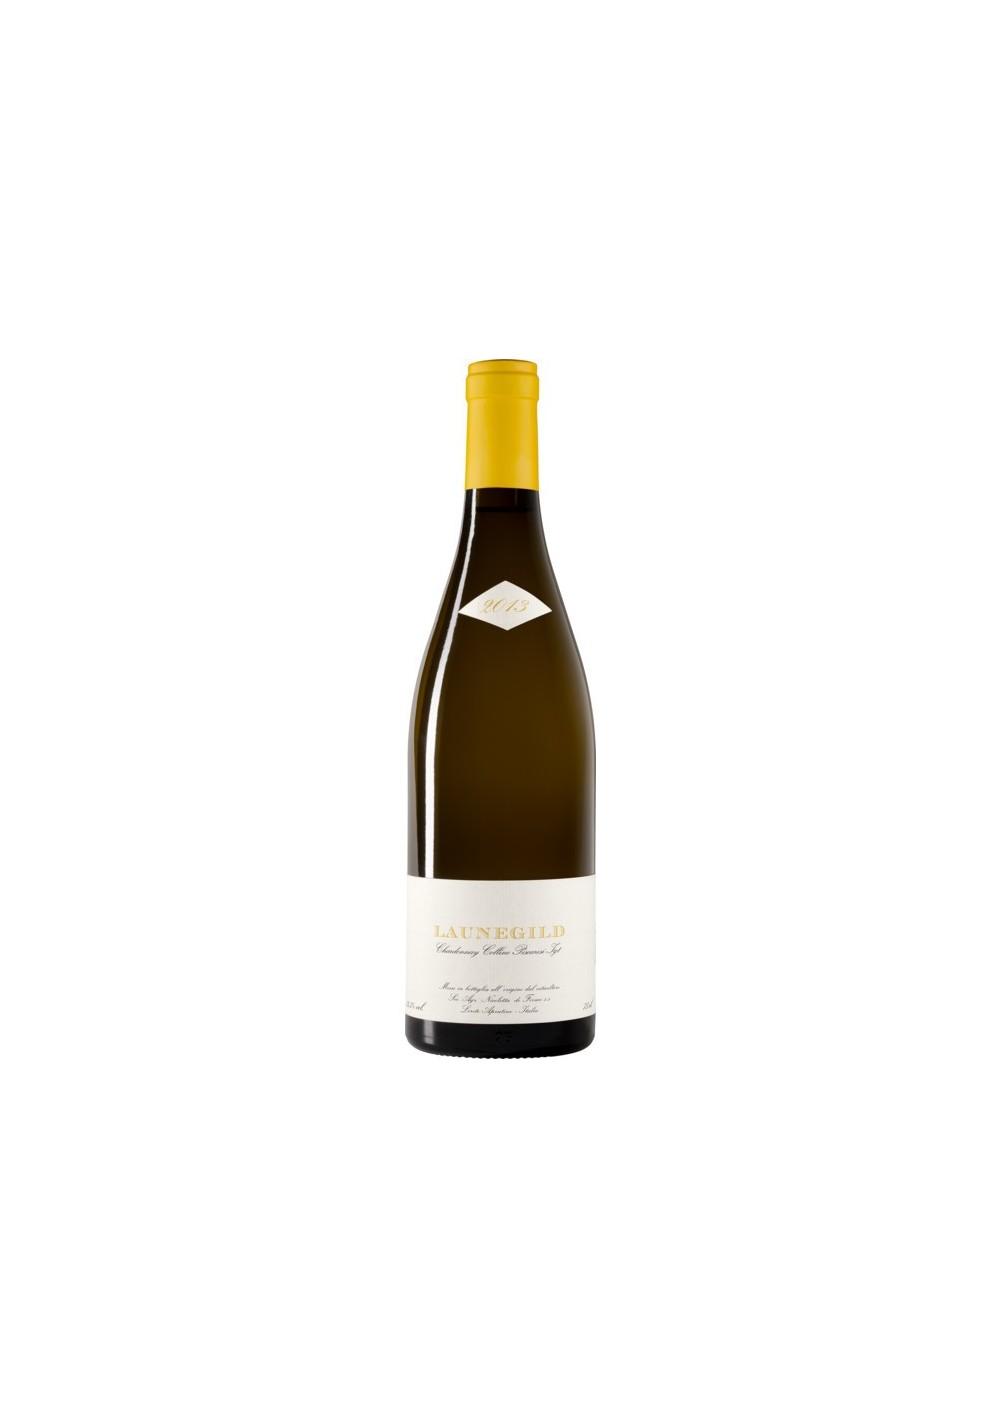 Launegild, Chardonnay Colline Pescaresi IGT 2015 - De Fermo